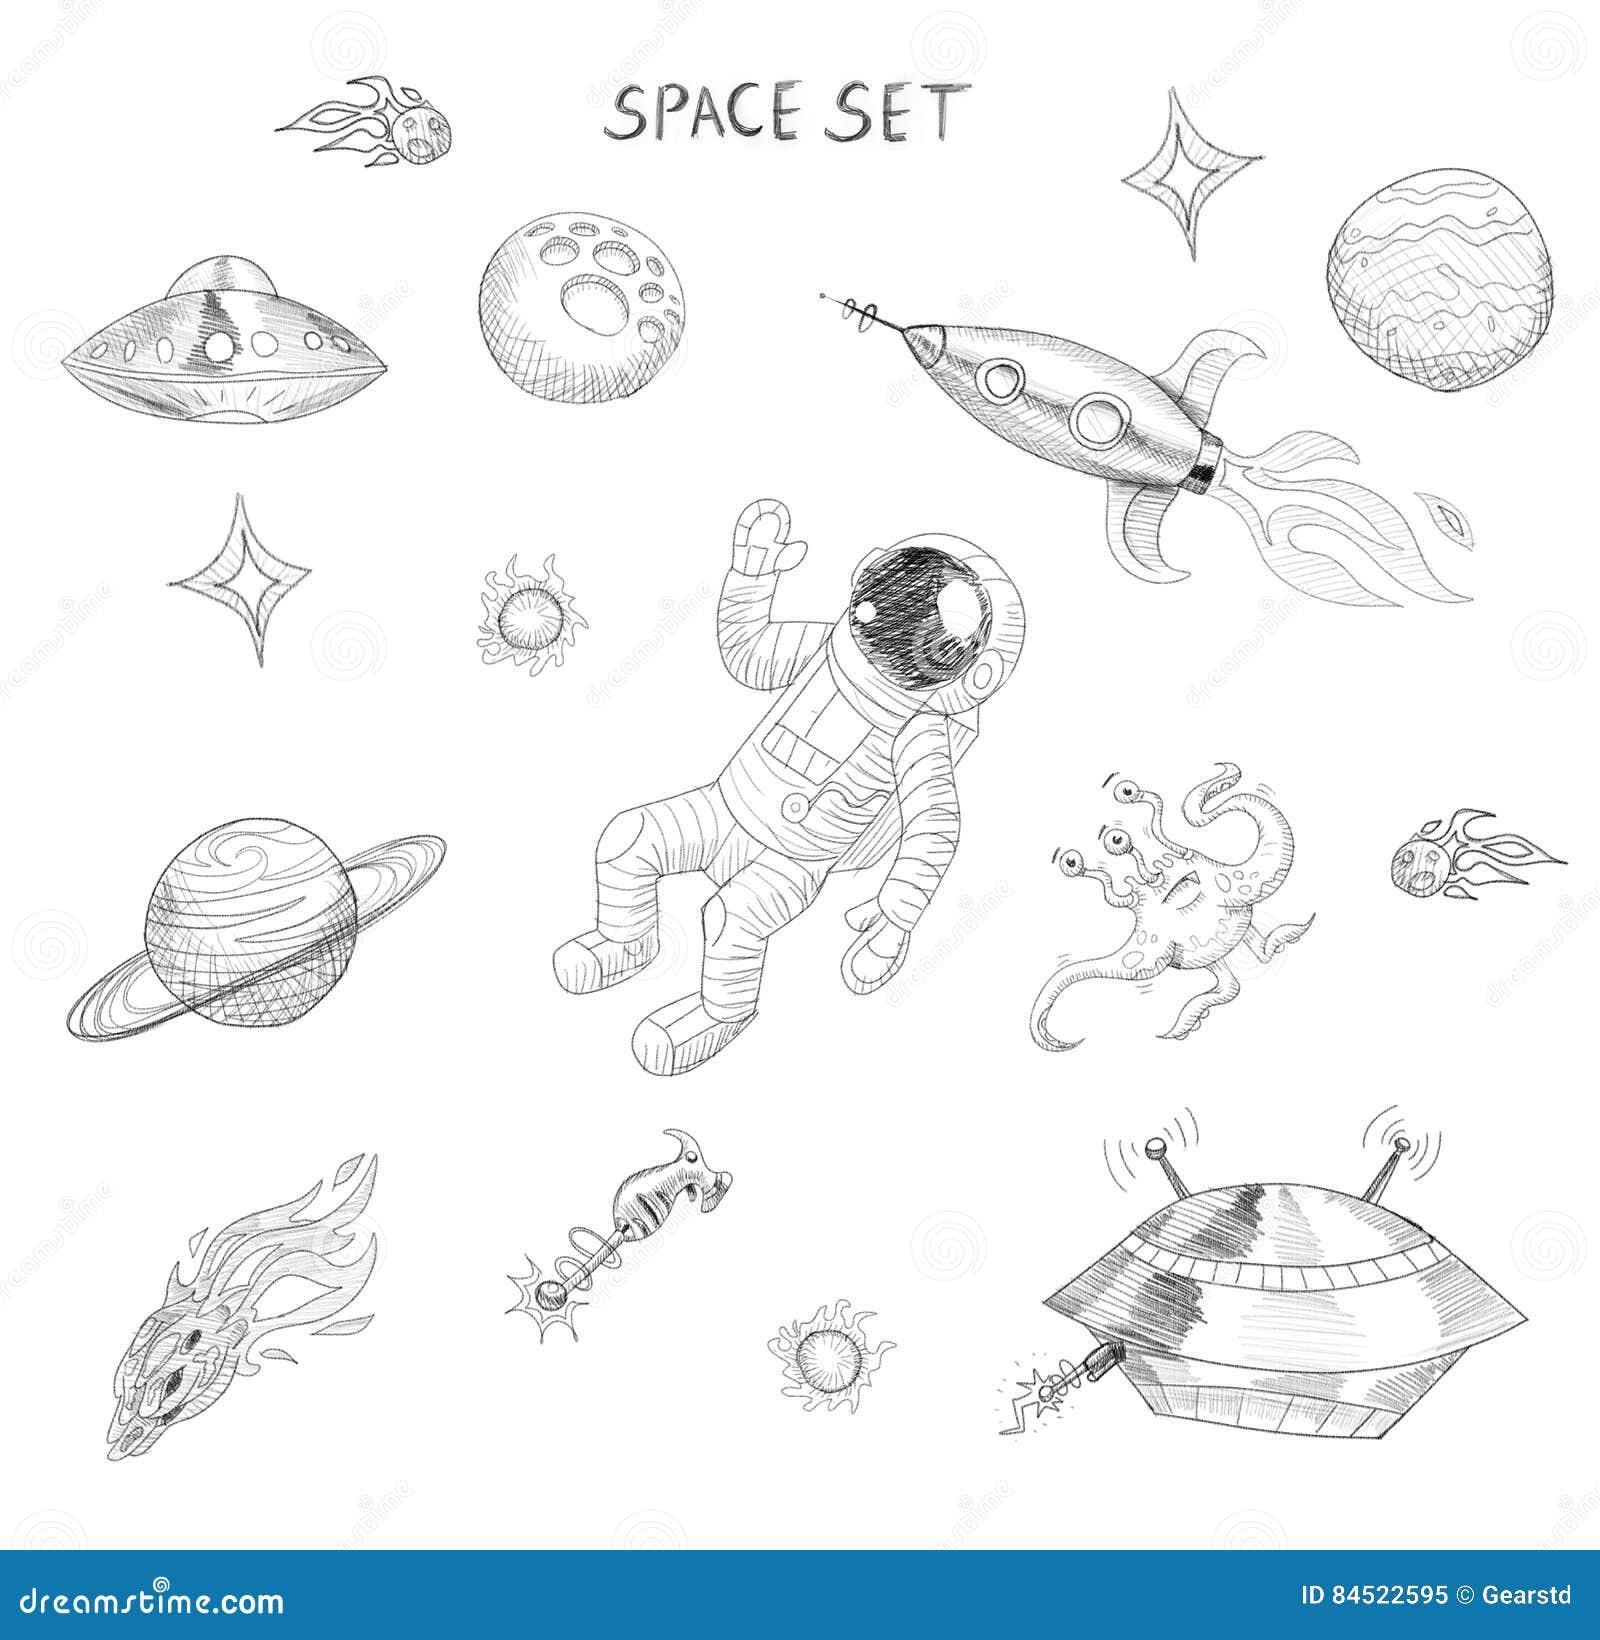 Dessin des objets de l 39 espace astronaute tranger ufo - Dibujos infantiles del espacio ...